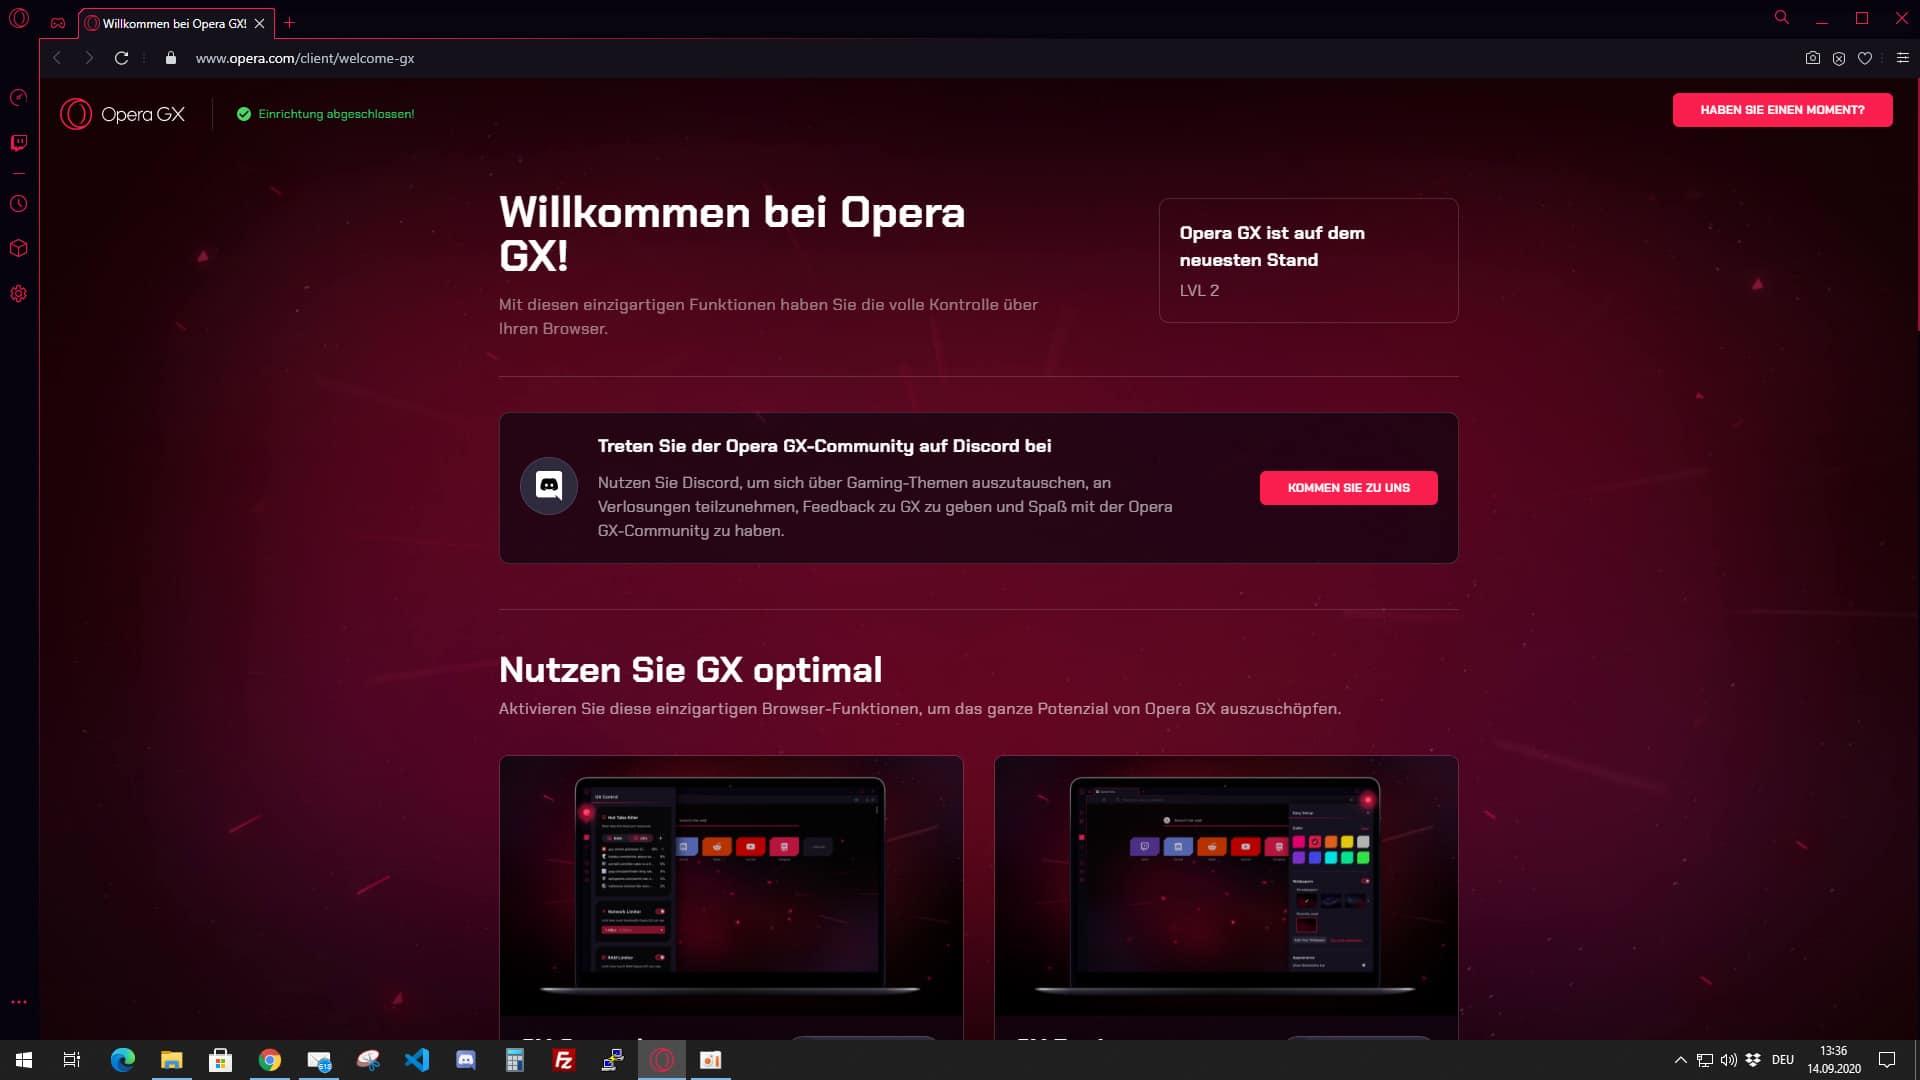 Opera GX - Gaming Browser - digitalewelt.at